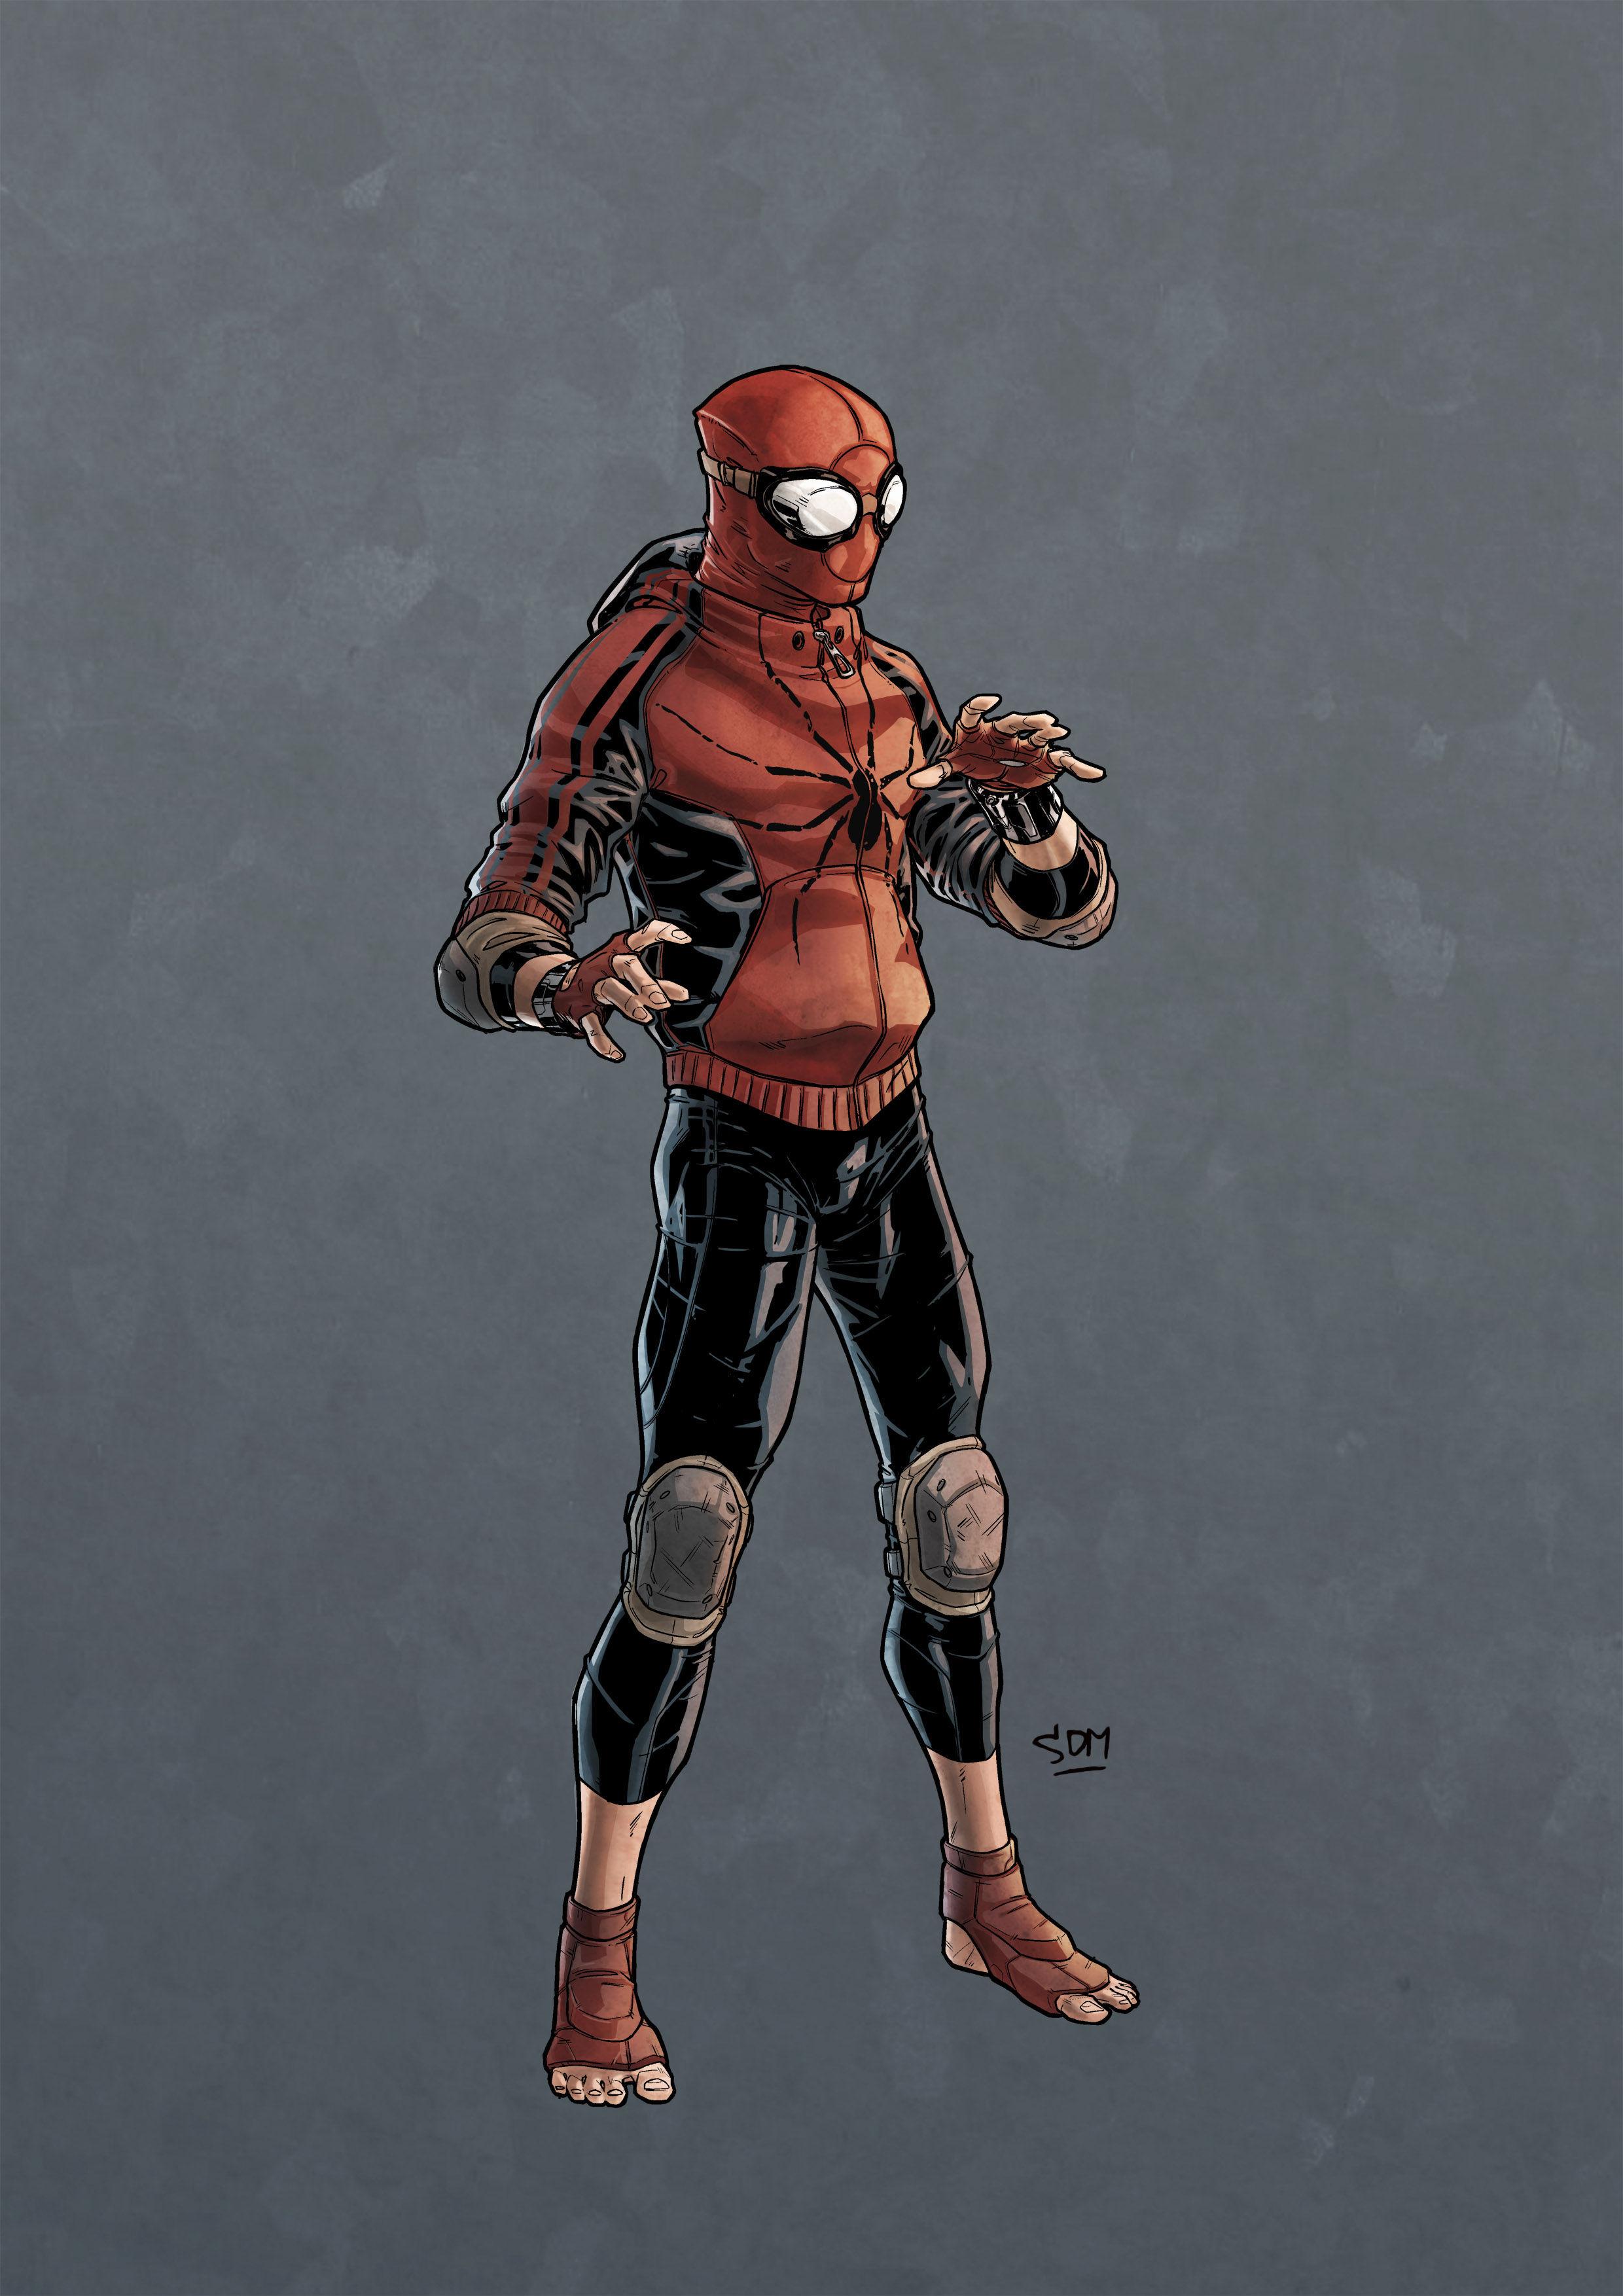 Spider-Man-concept-fan-art-Captain-America-Civil-War